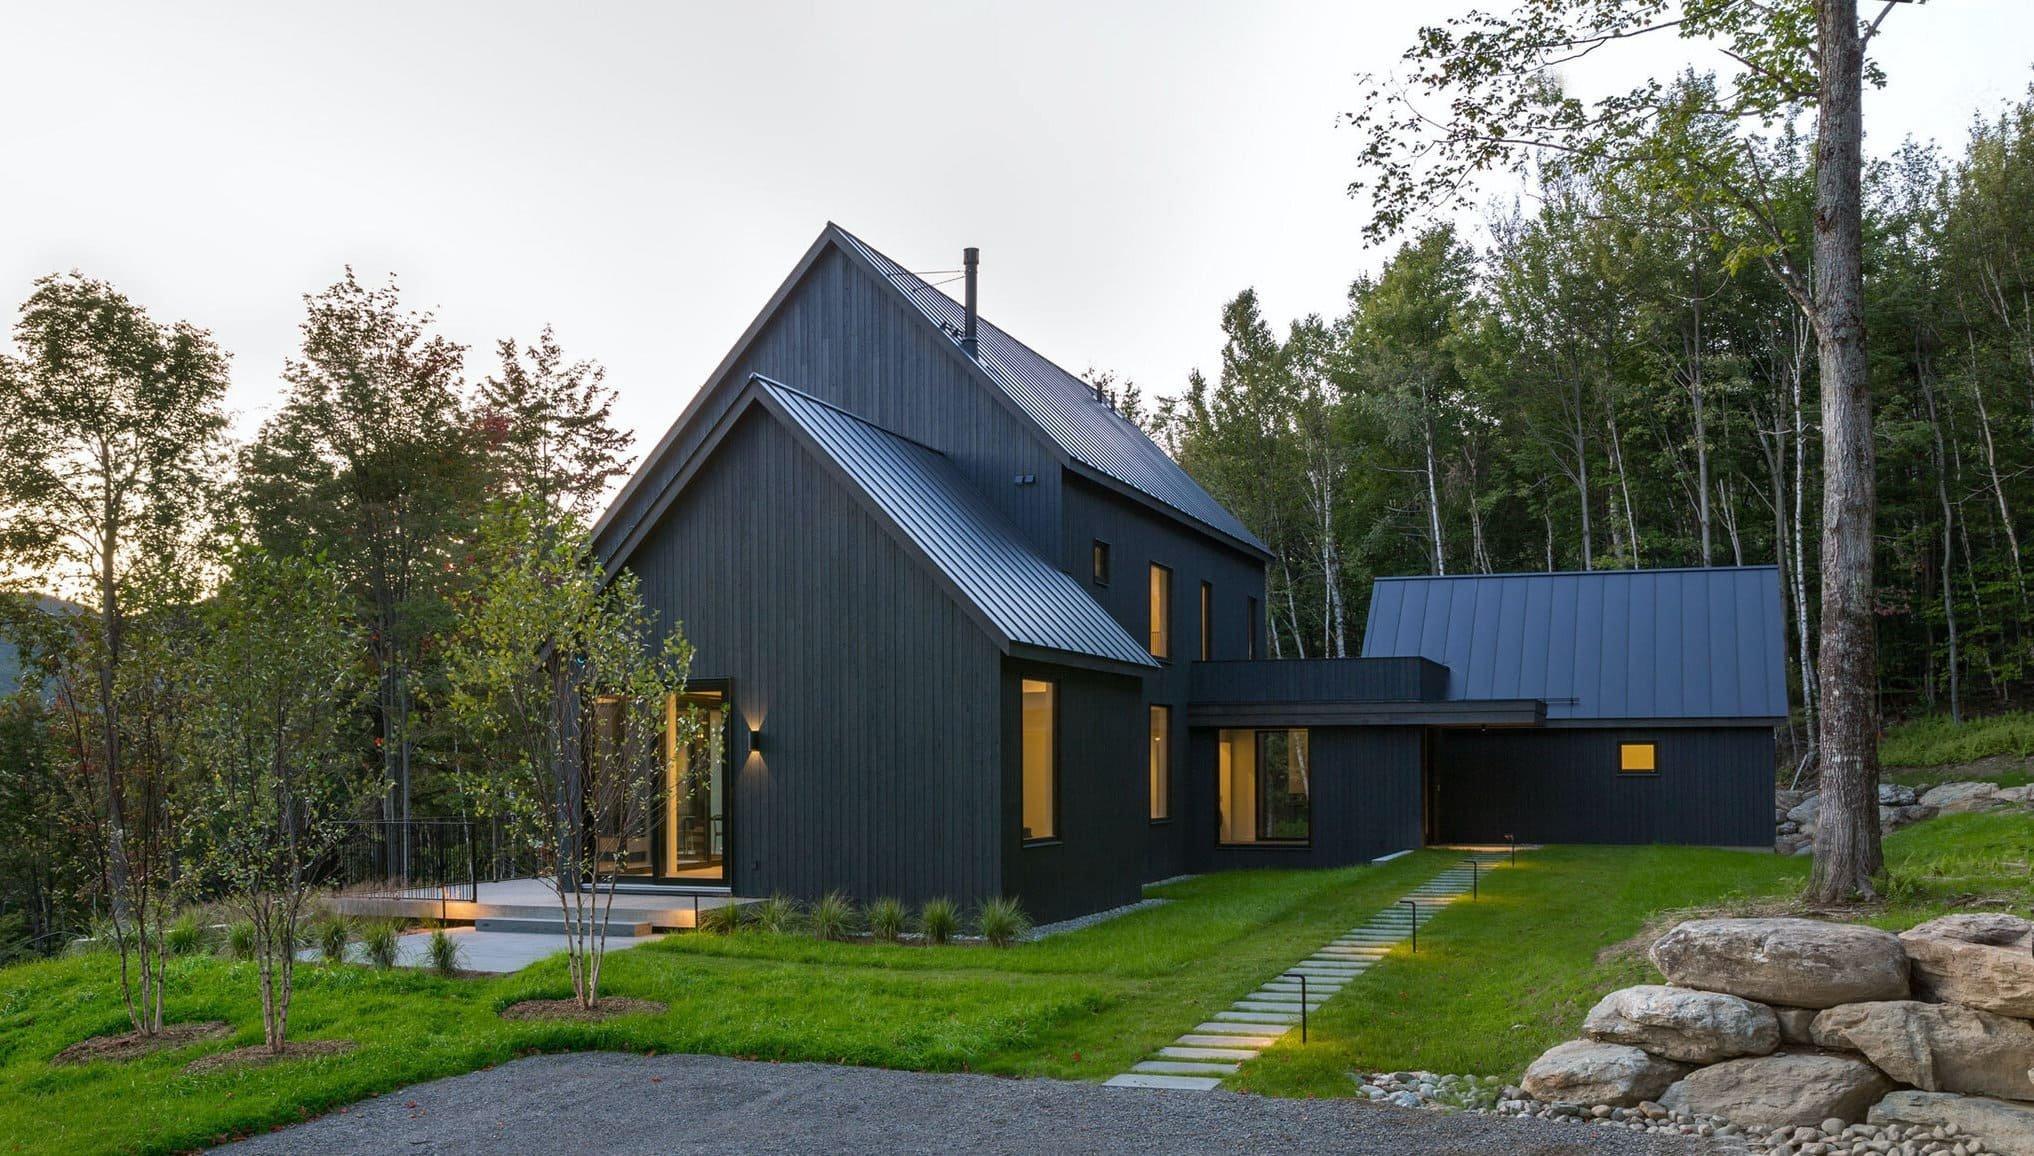 Venkovský dům na svahu obklopený lesem